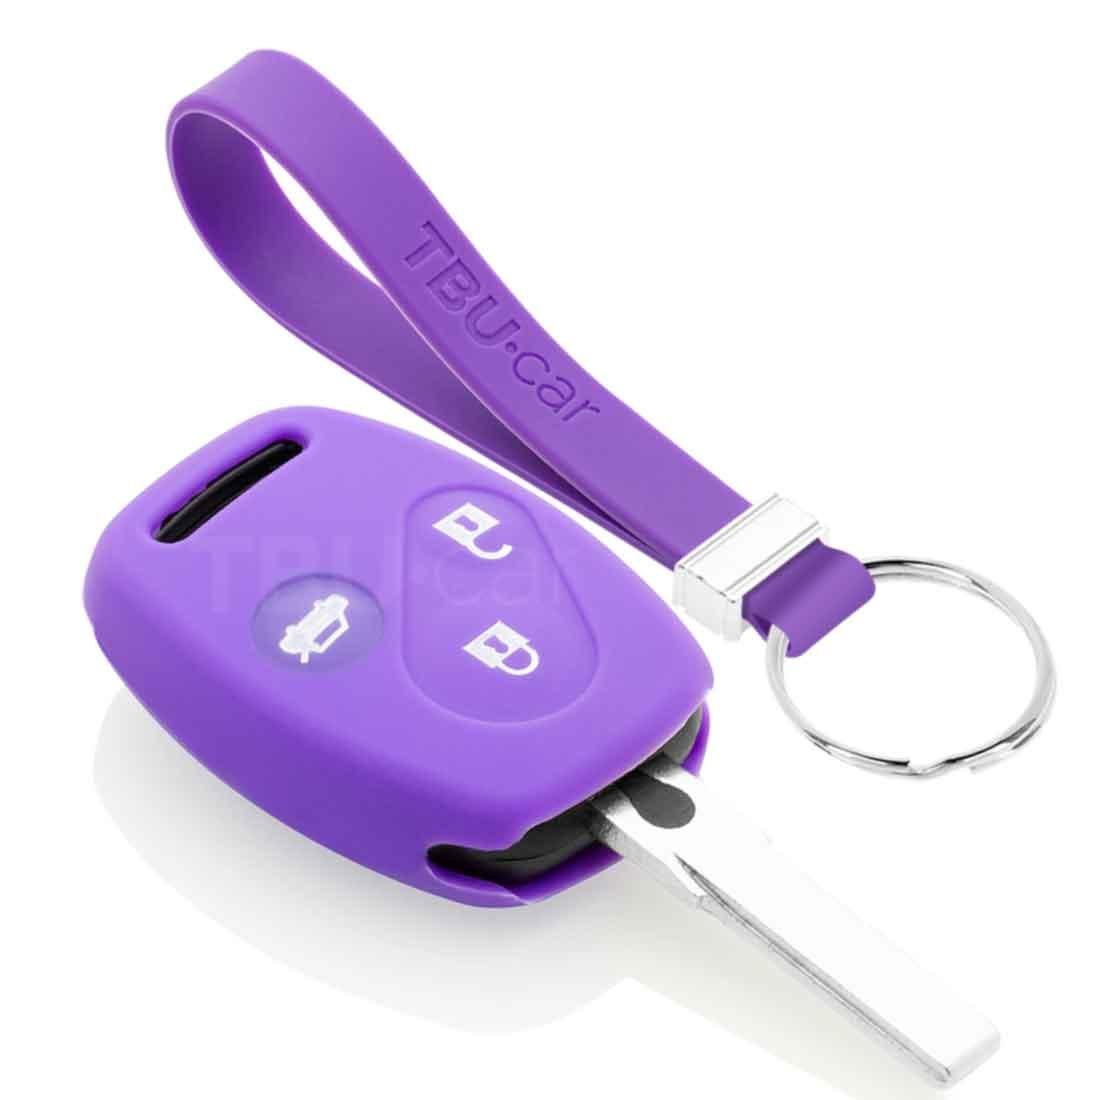 TBU car TBU car Sleutel cover compatibel met Honda - Silicone sleutelhoesje - beschermhoesje autosleutel - Paars